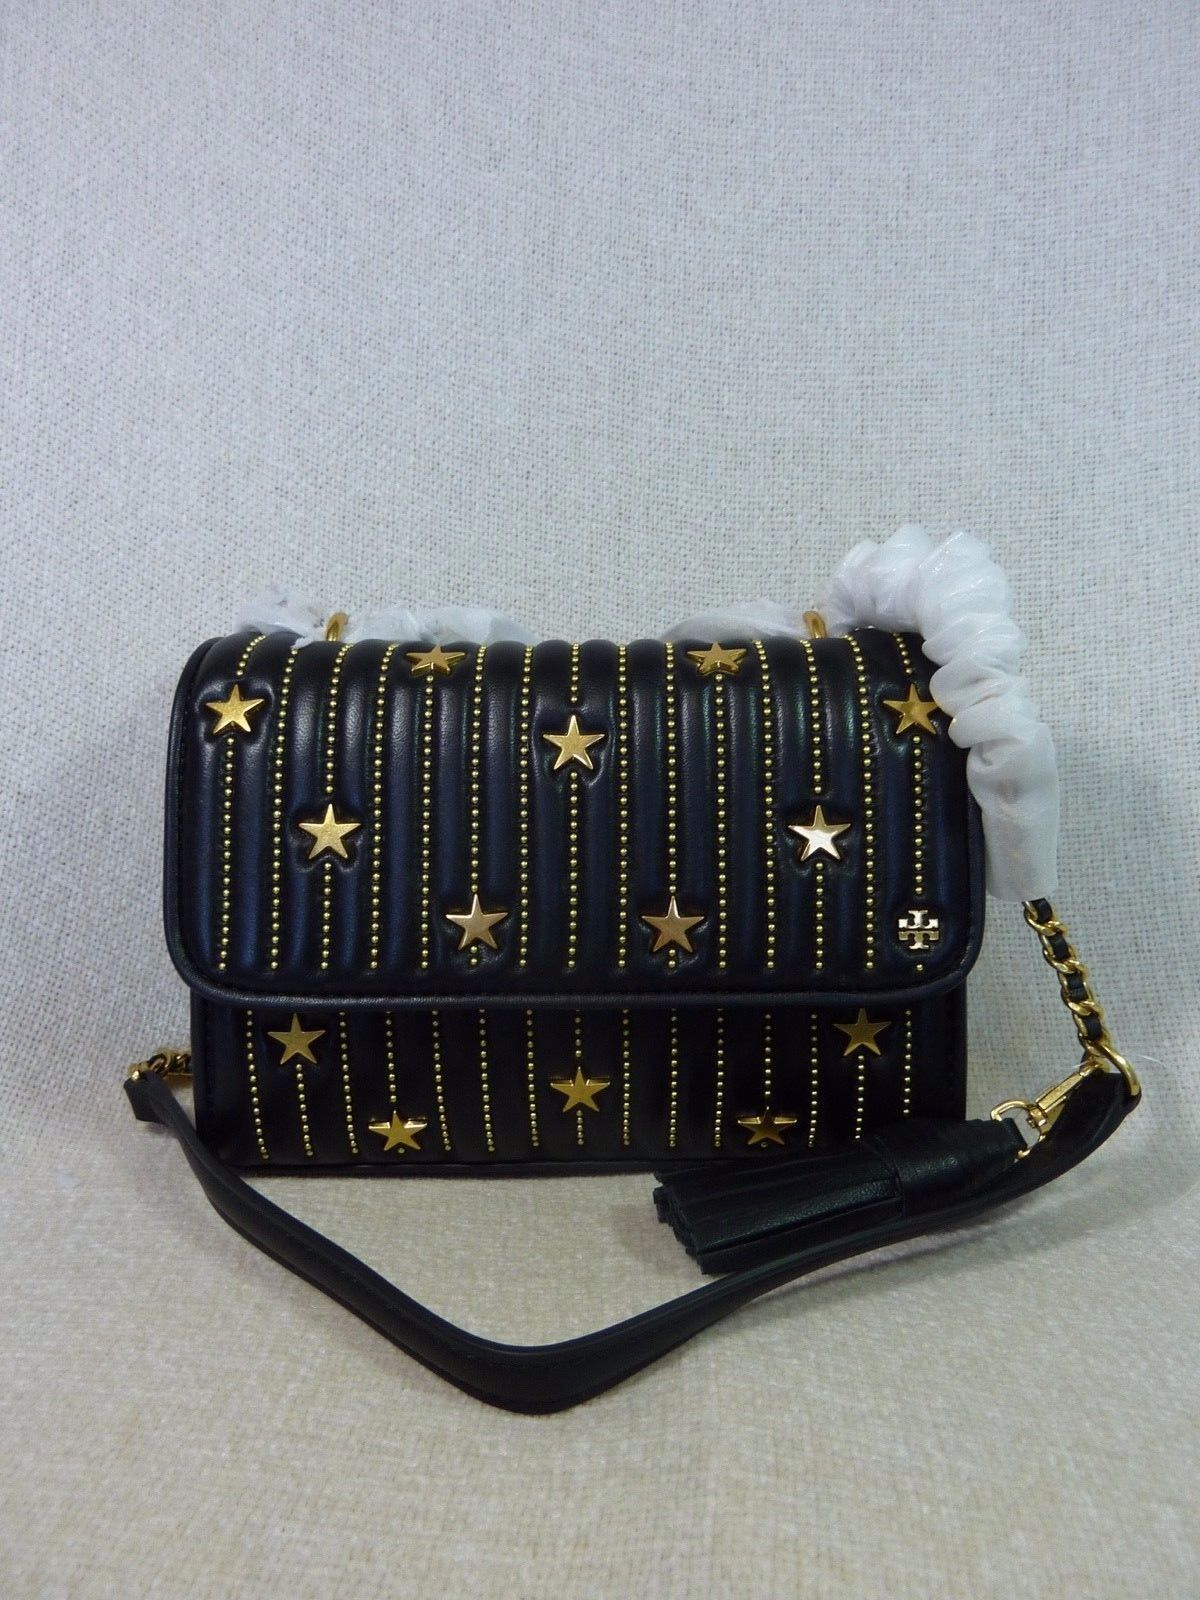 NWT Tory Burch Black Fleming Star-Stud Small Convertible Bag